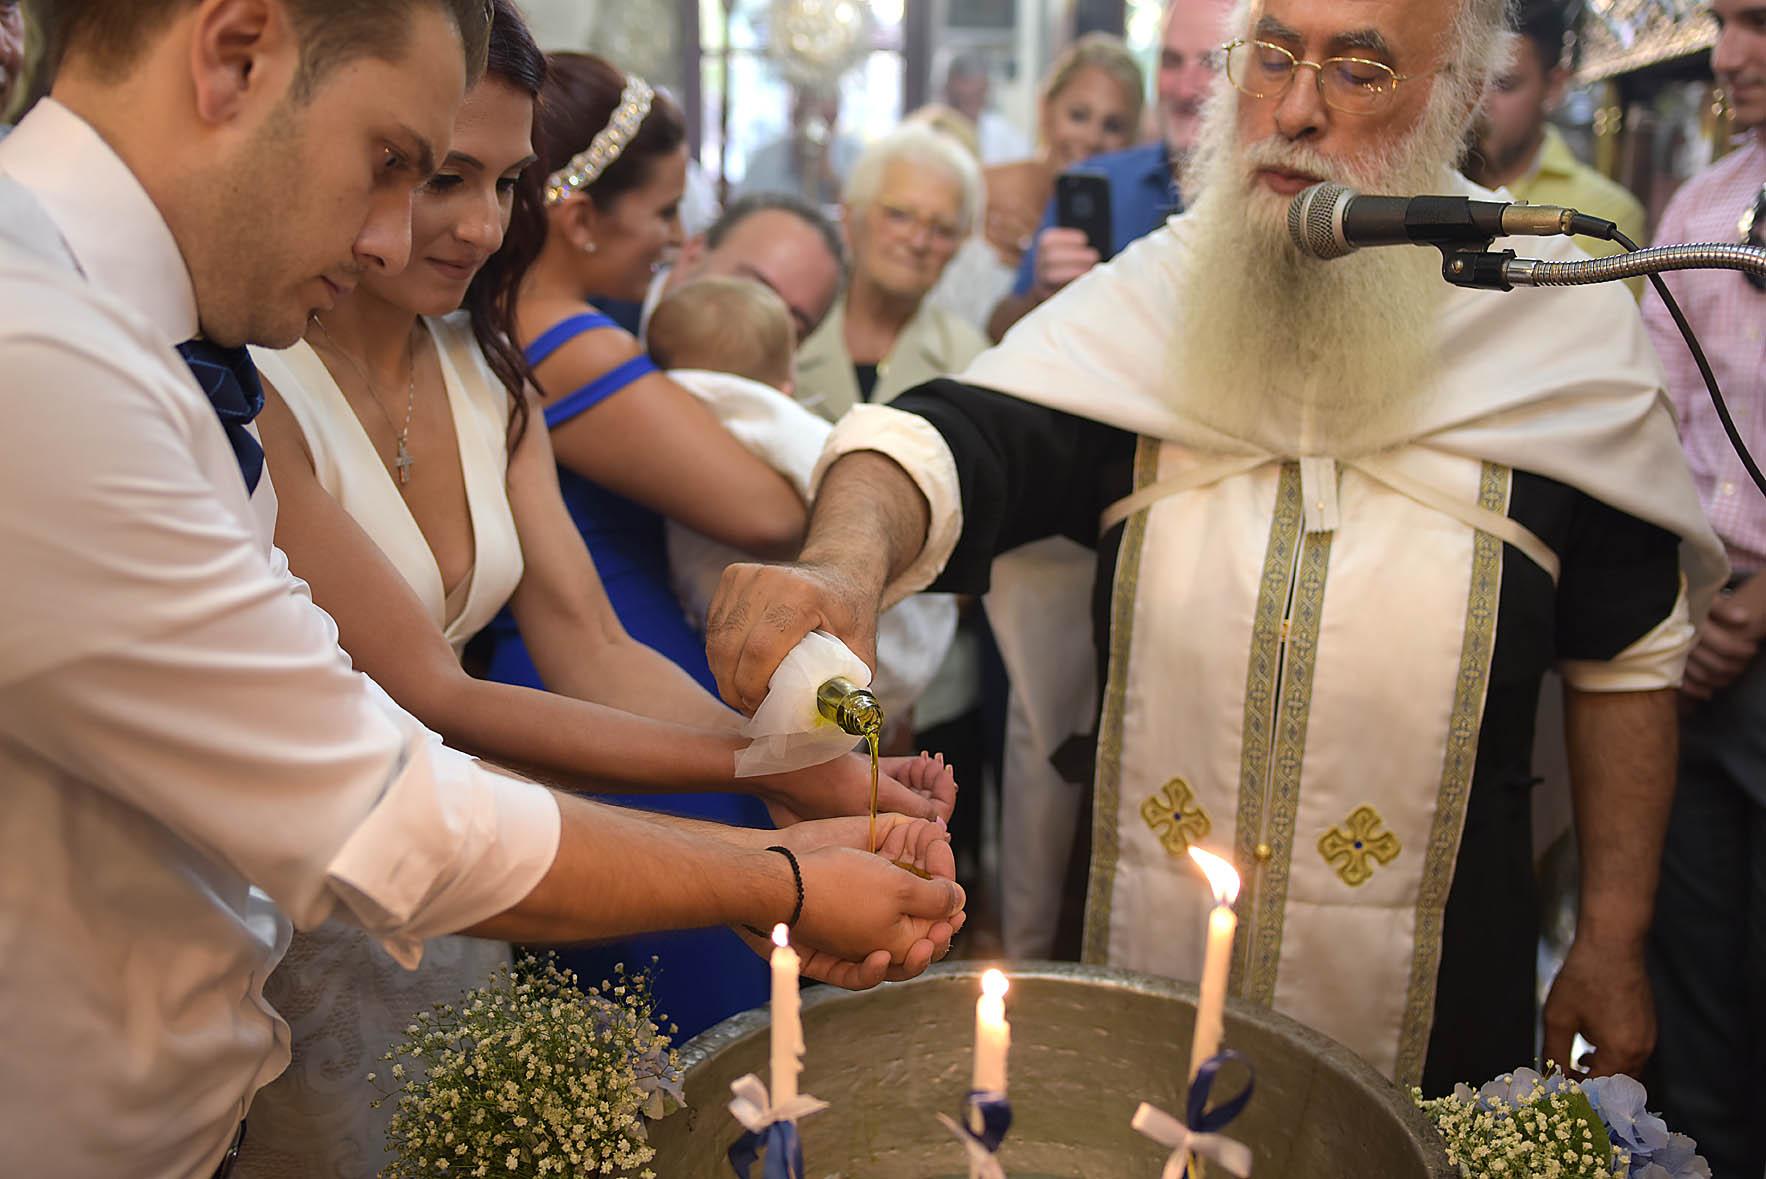 panagia-siriotissa-kampos-chios-christening-baptism-alexis-koumaditis-photography-14